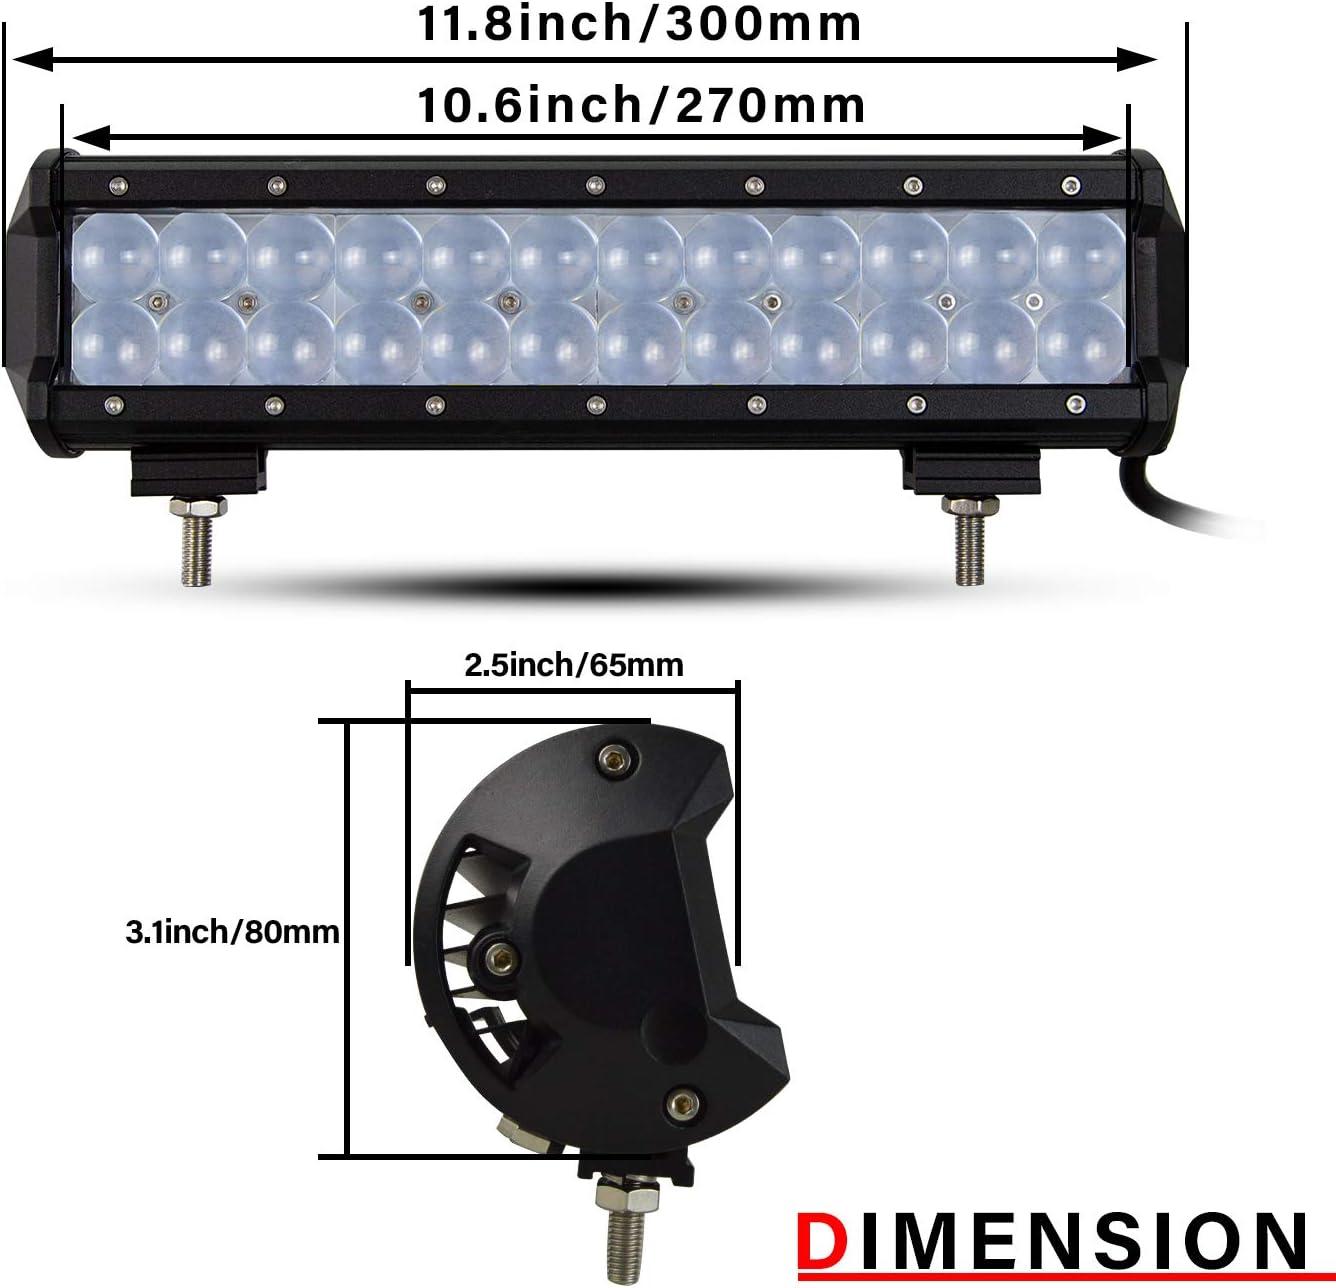 SKYWORLD 20 pulgada 50cm Barra de luz LED Ojo de pez recto 126W Luces de trabajo de punto de inundaci/ón de alto brillo Luces de trabajo Offroad con arn/és de cableado de 10 pies para cami/ón SUV 4X4 ATV